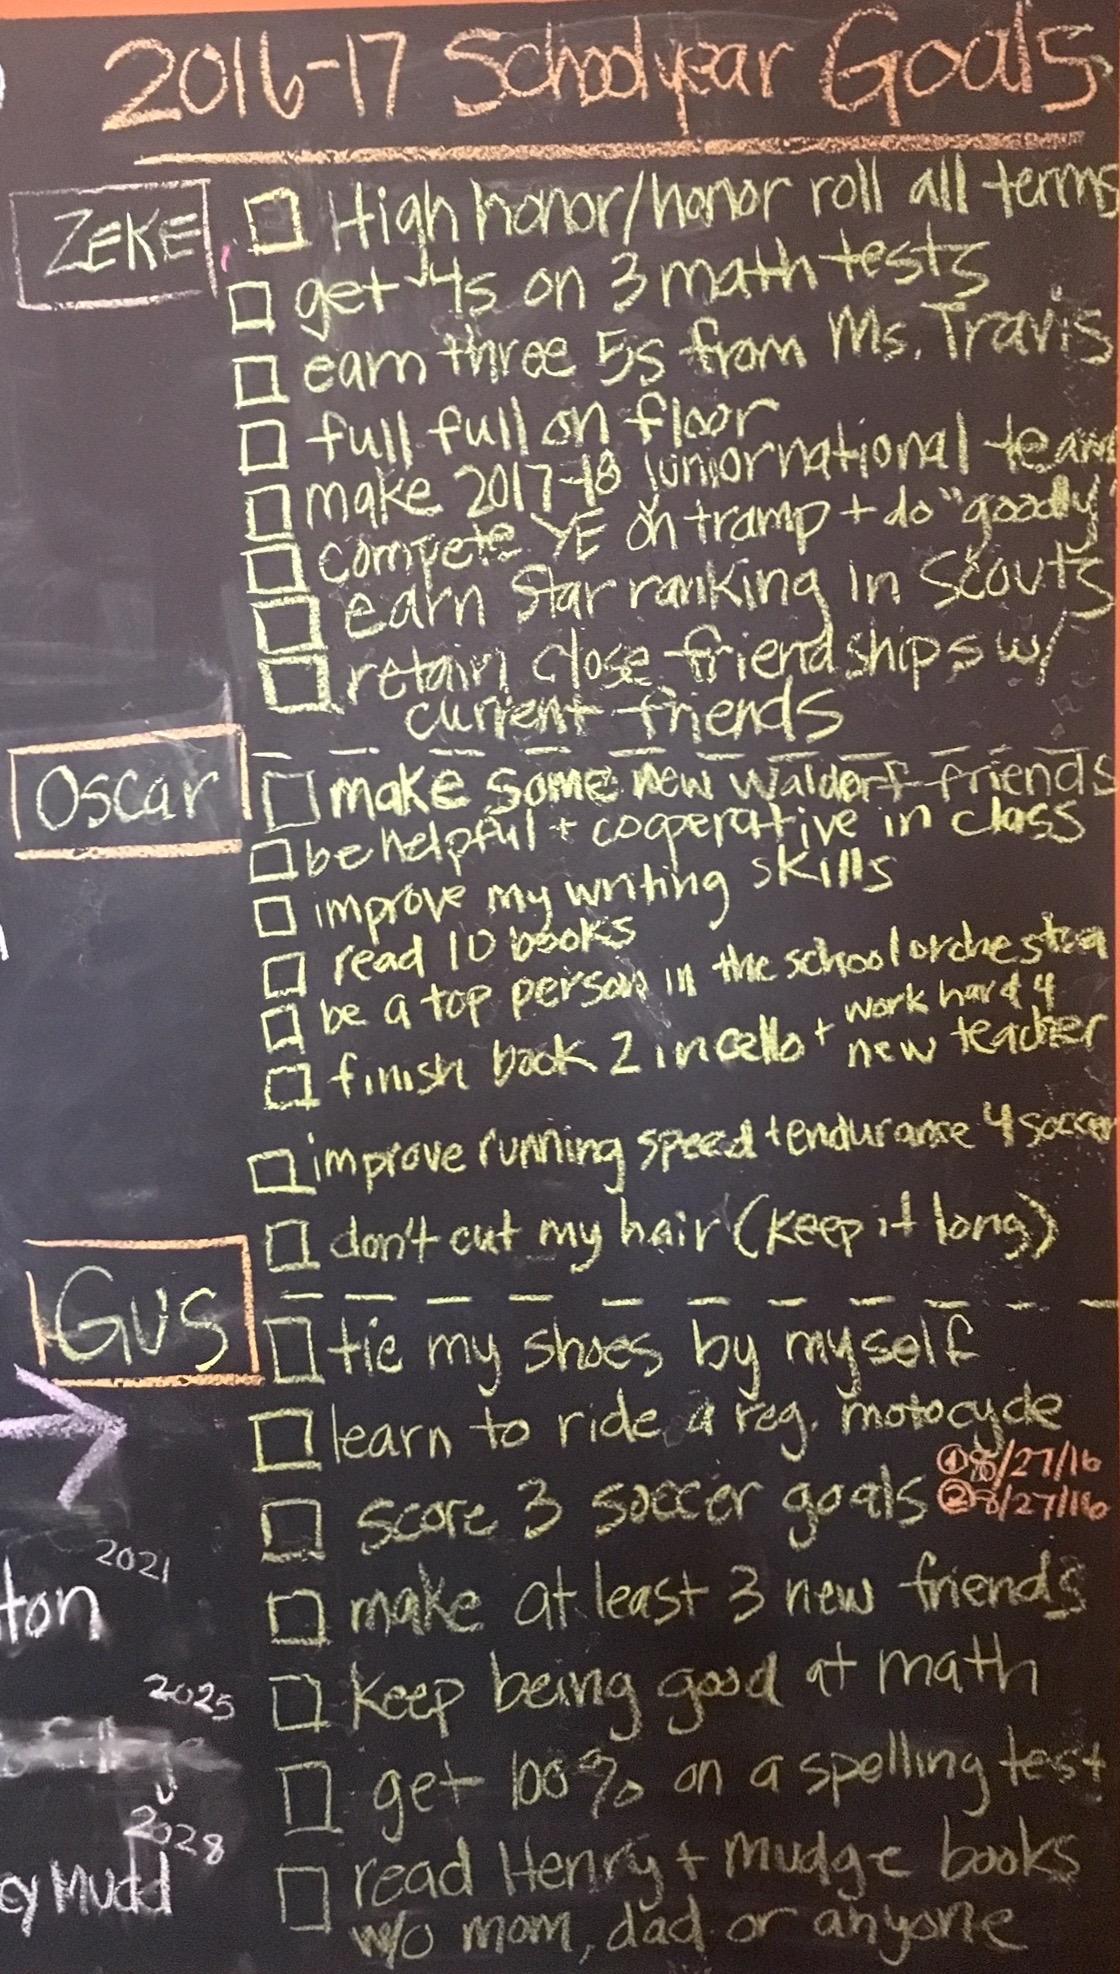 school year goals chalkboard - StGeorgeNews.com